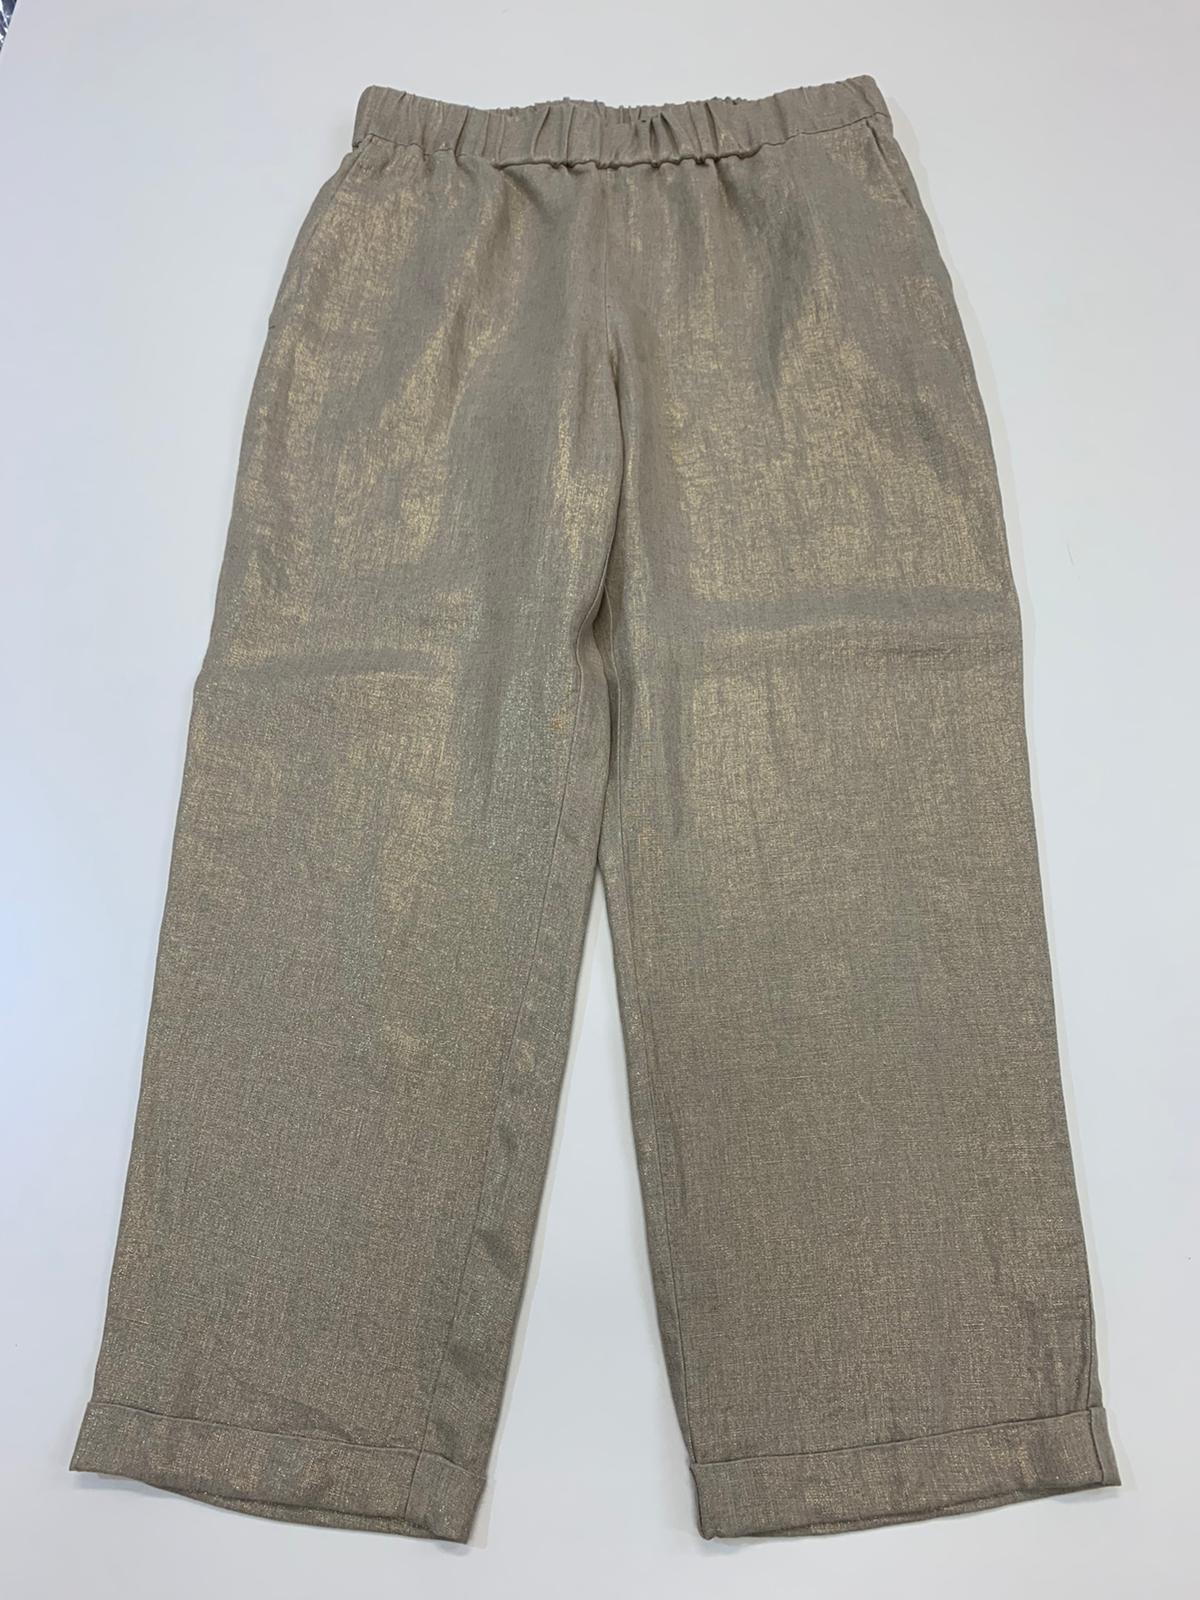 Pantalone Donna Seventy lino Fango